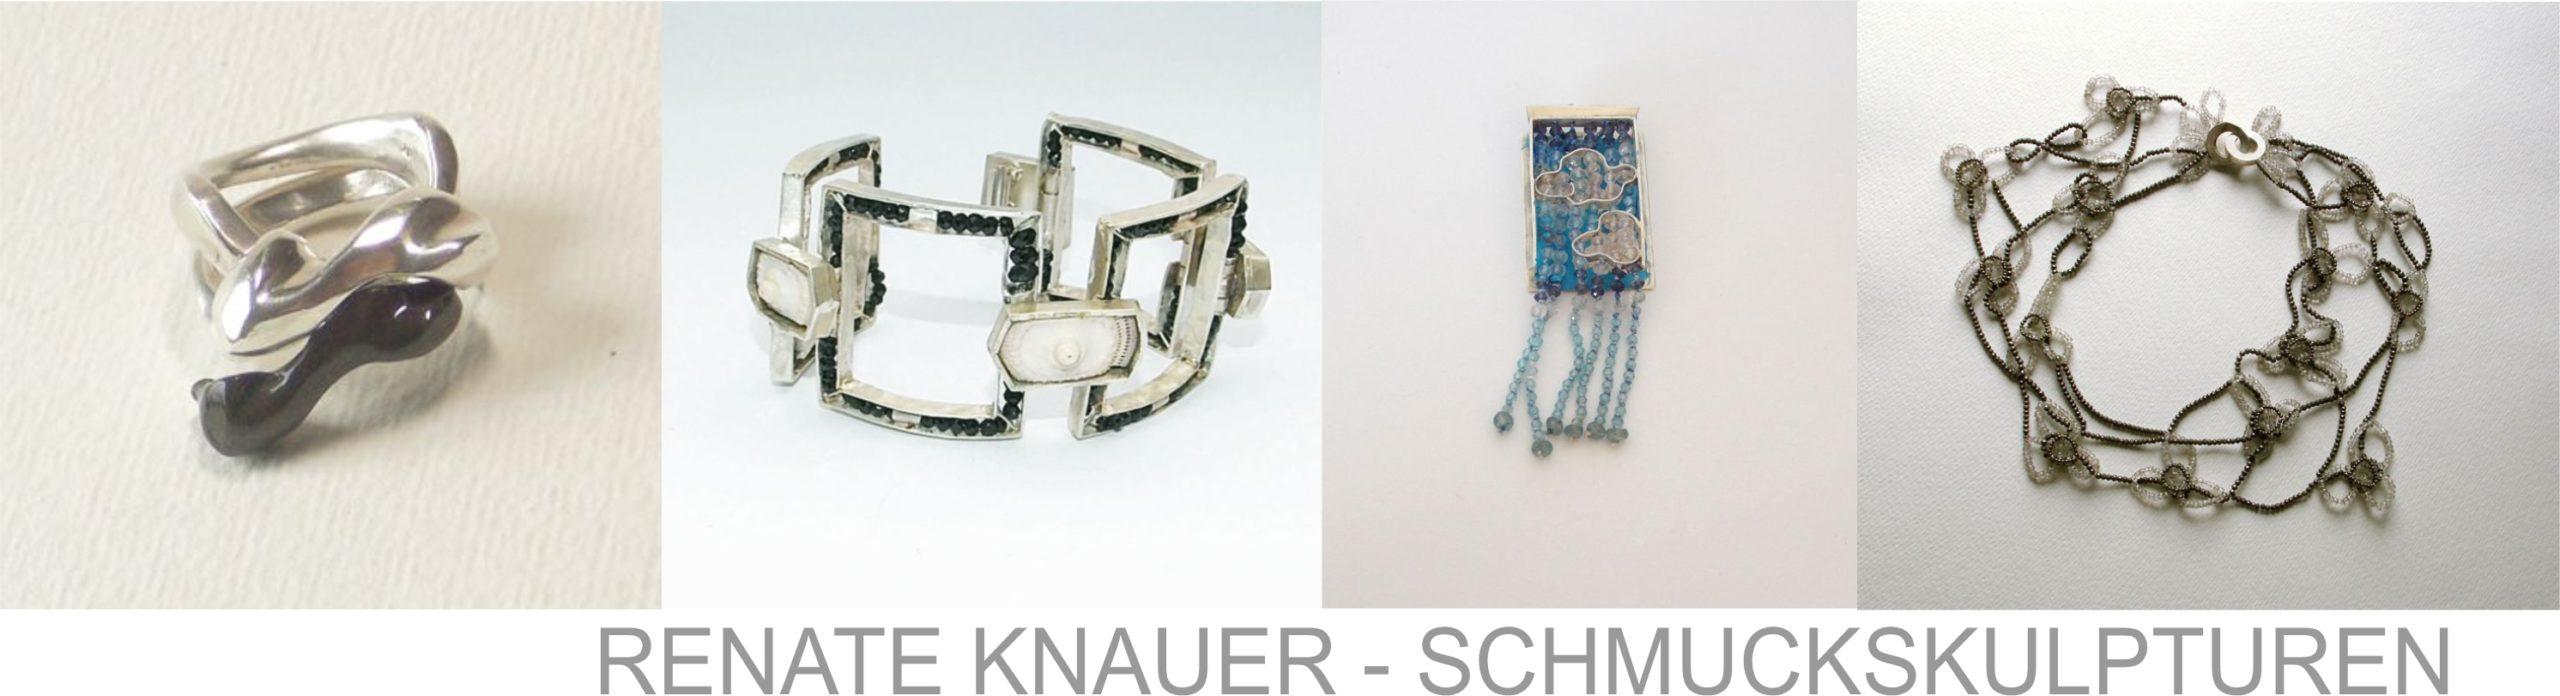 Renate Knauer  Schmuckskulpturen